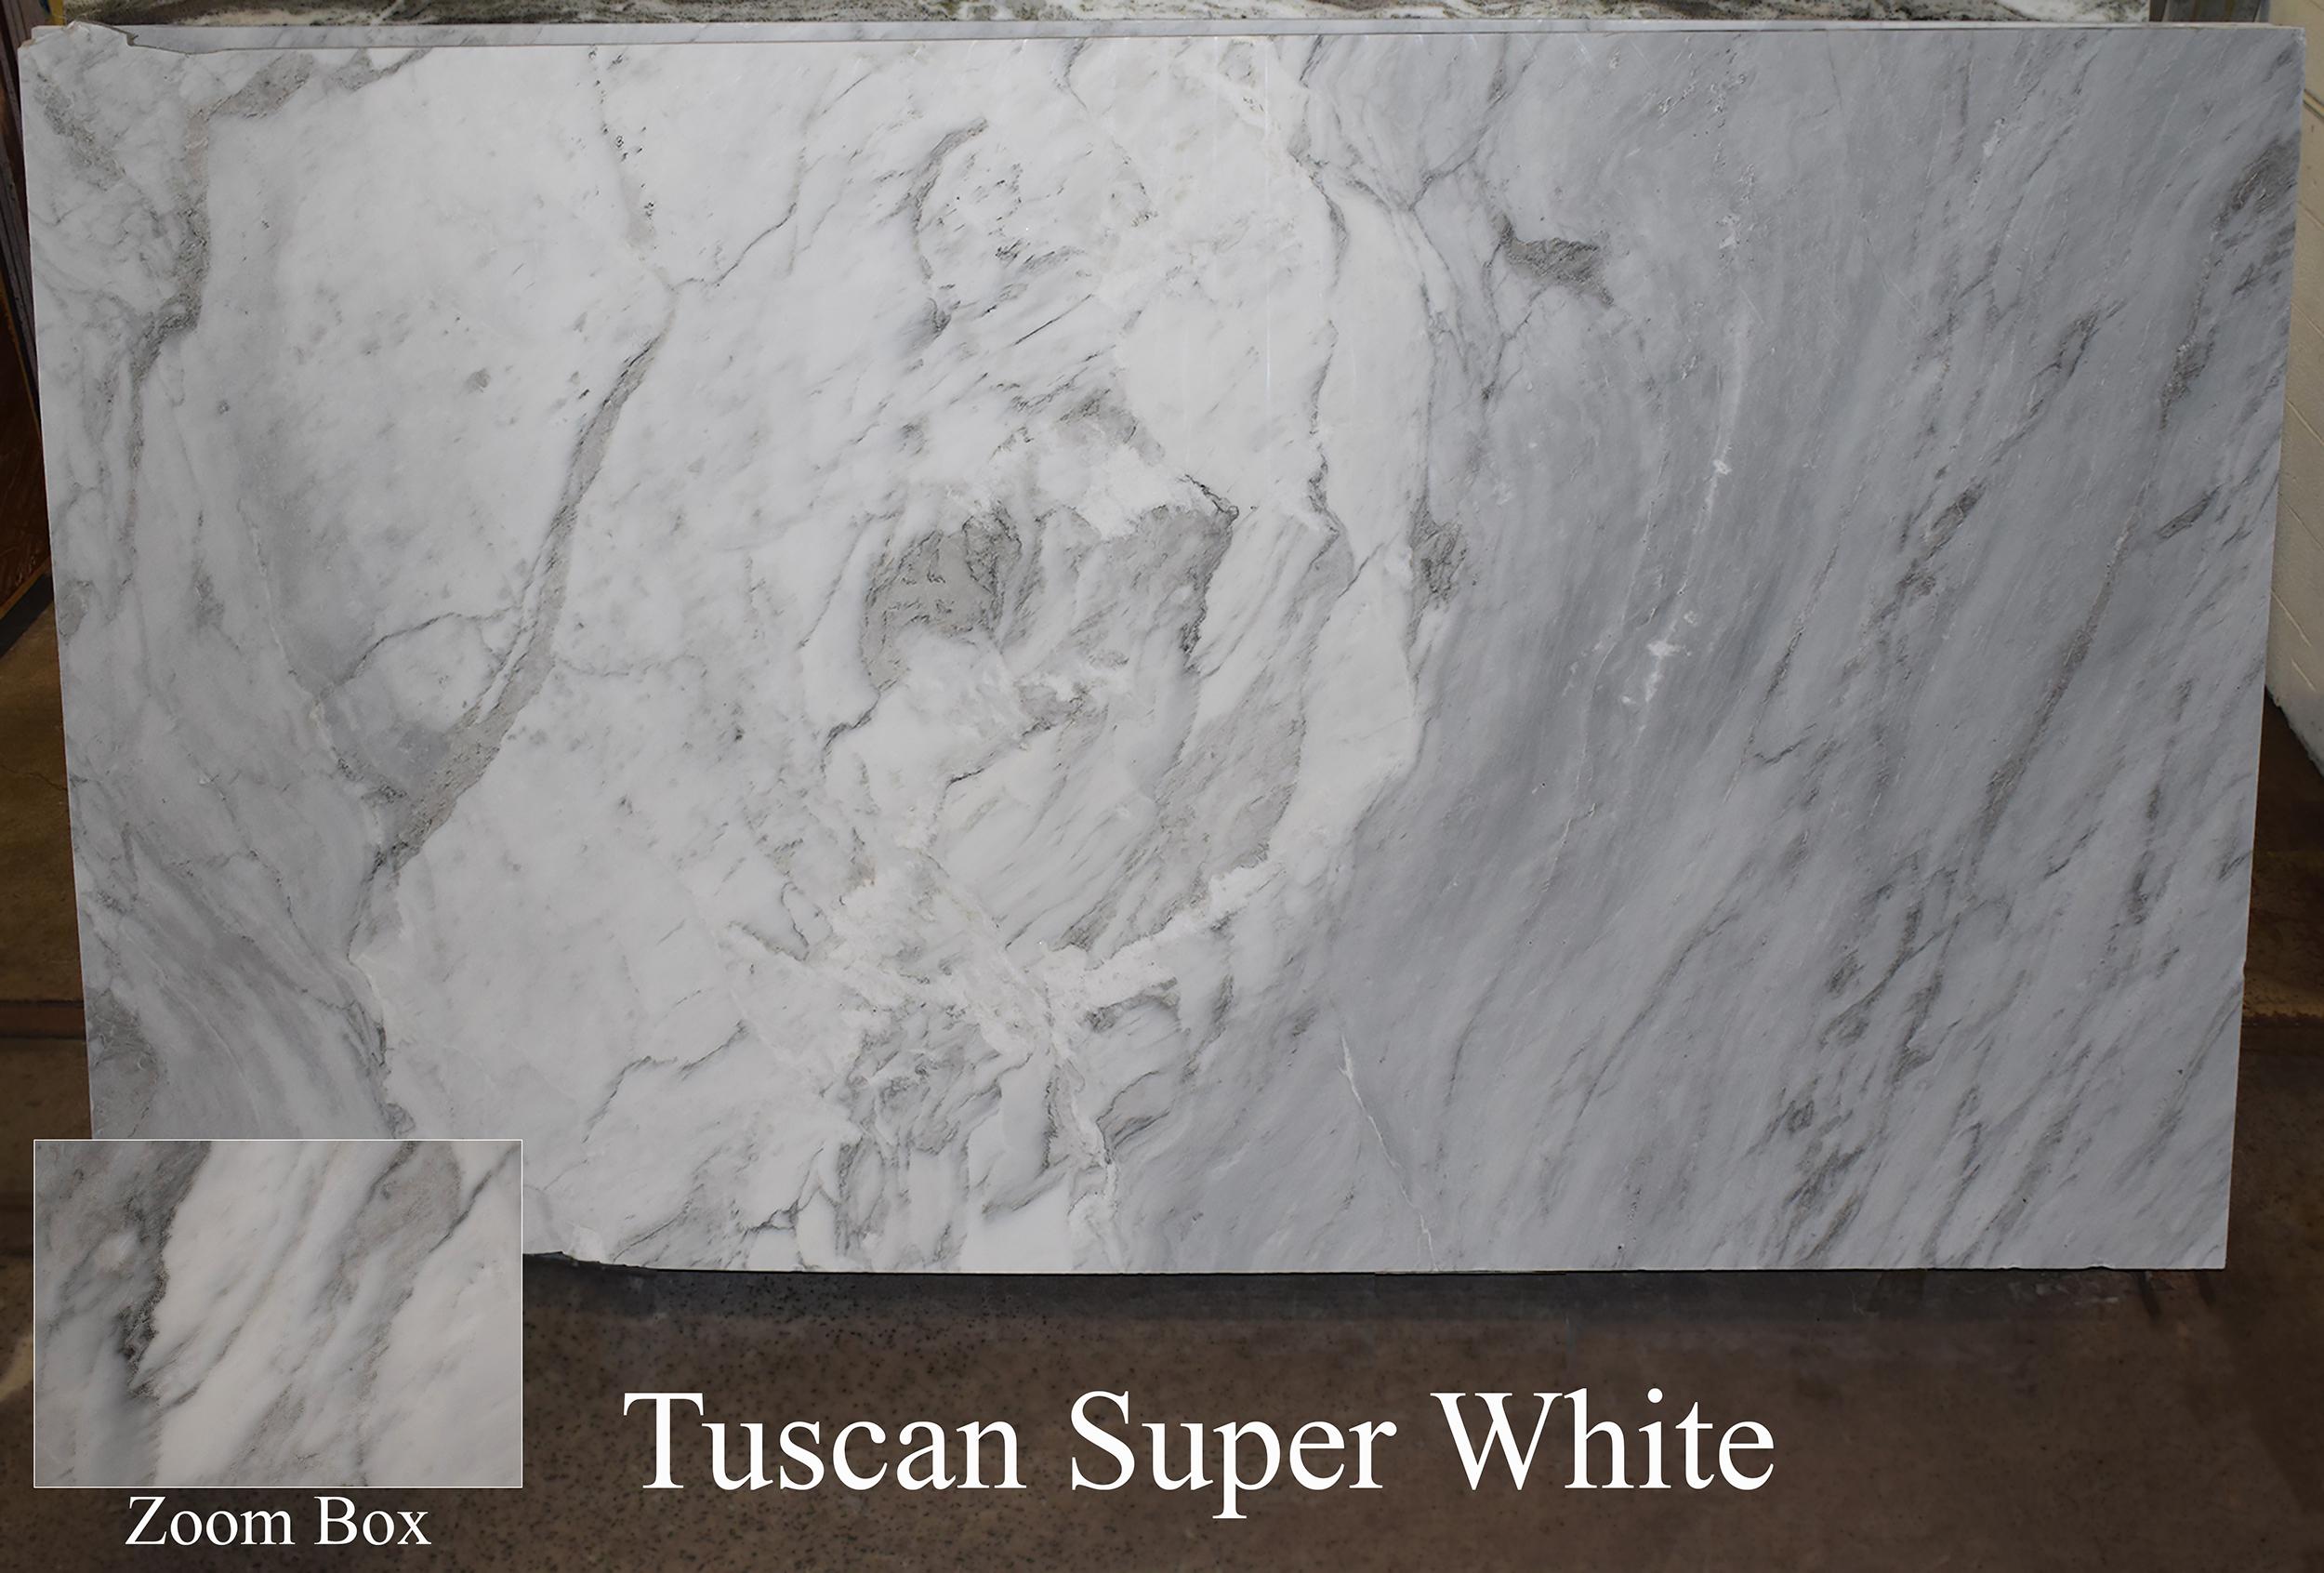 TUSCAN SUPER WHITE